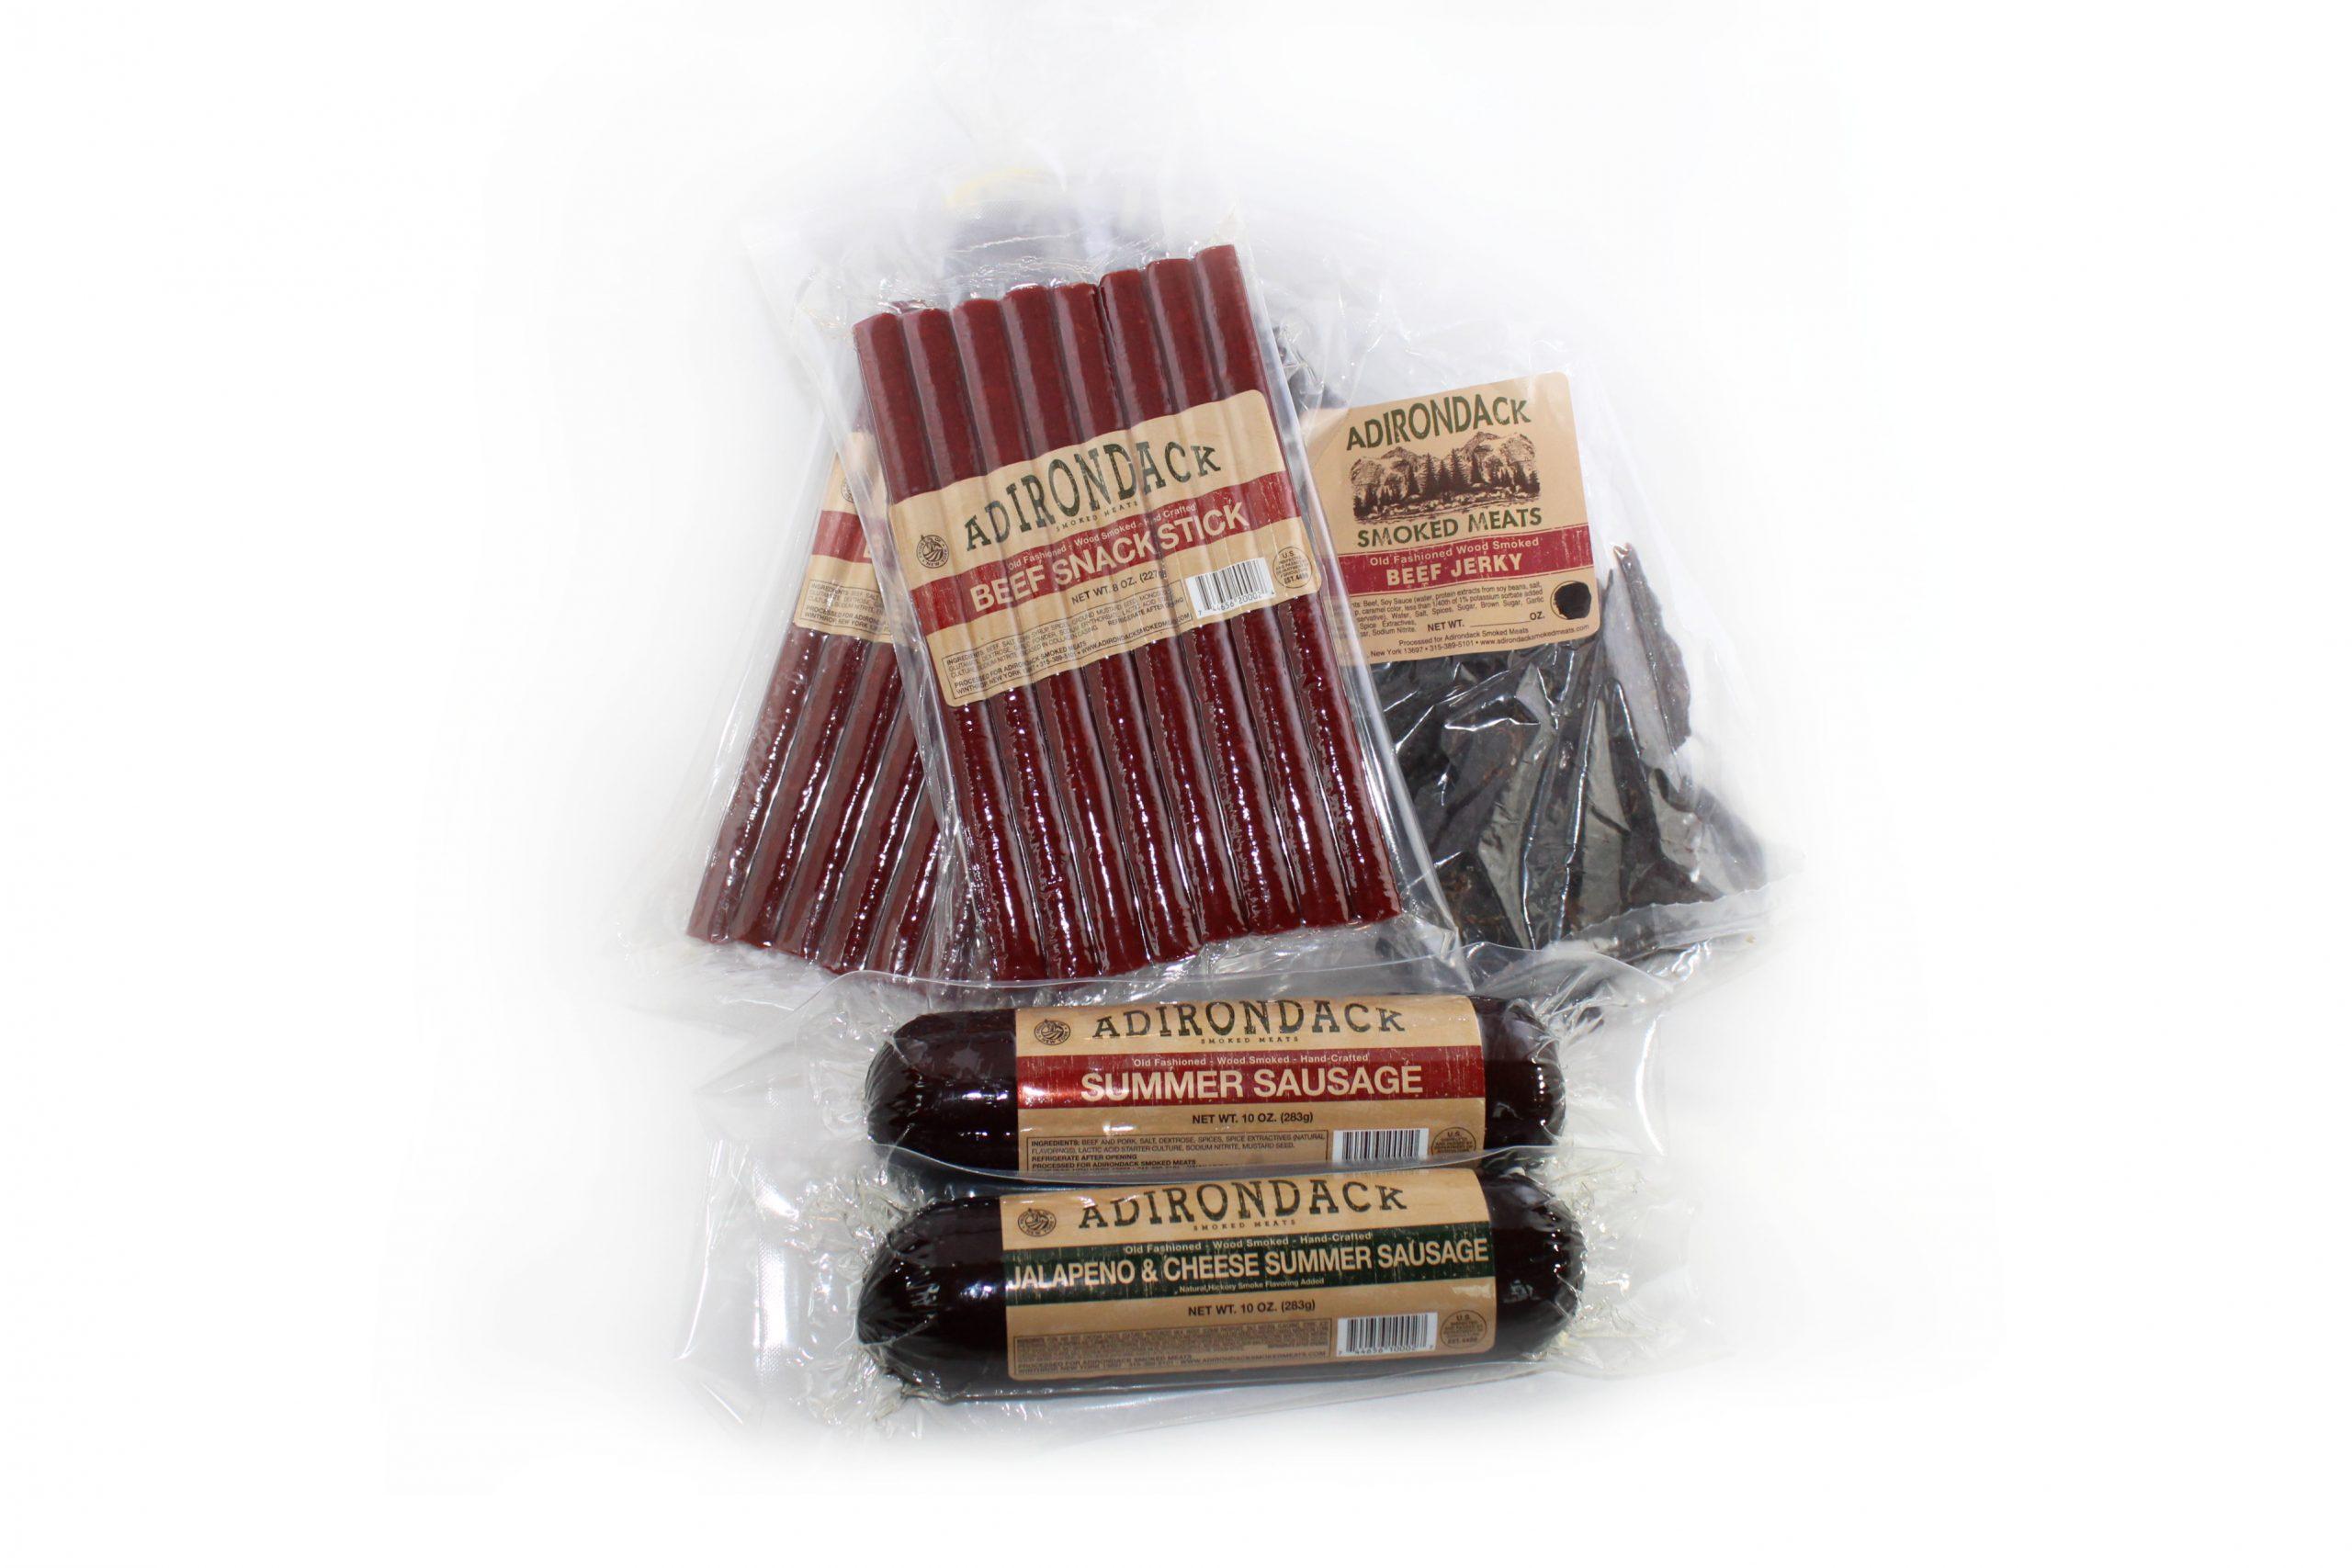 Adirondack Smoked Meat Sampler Pack